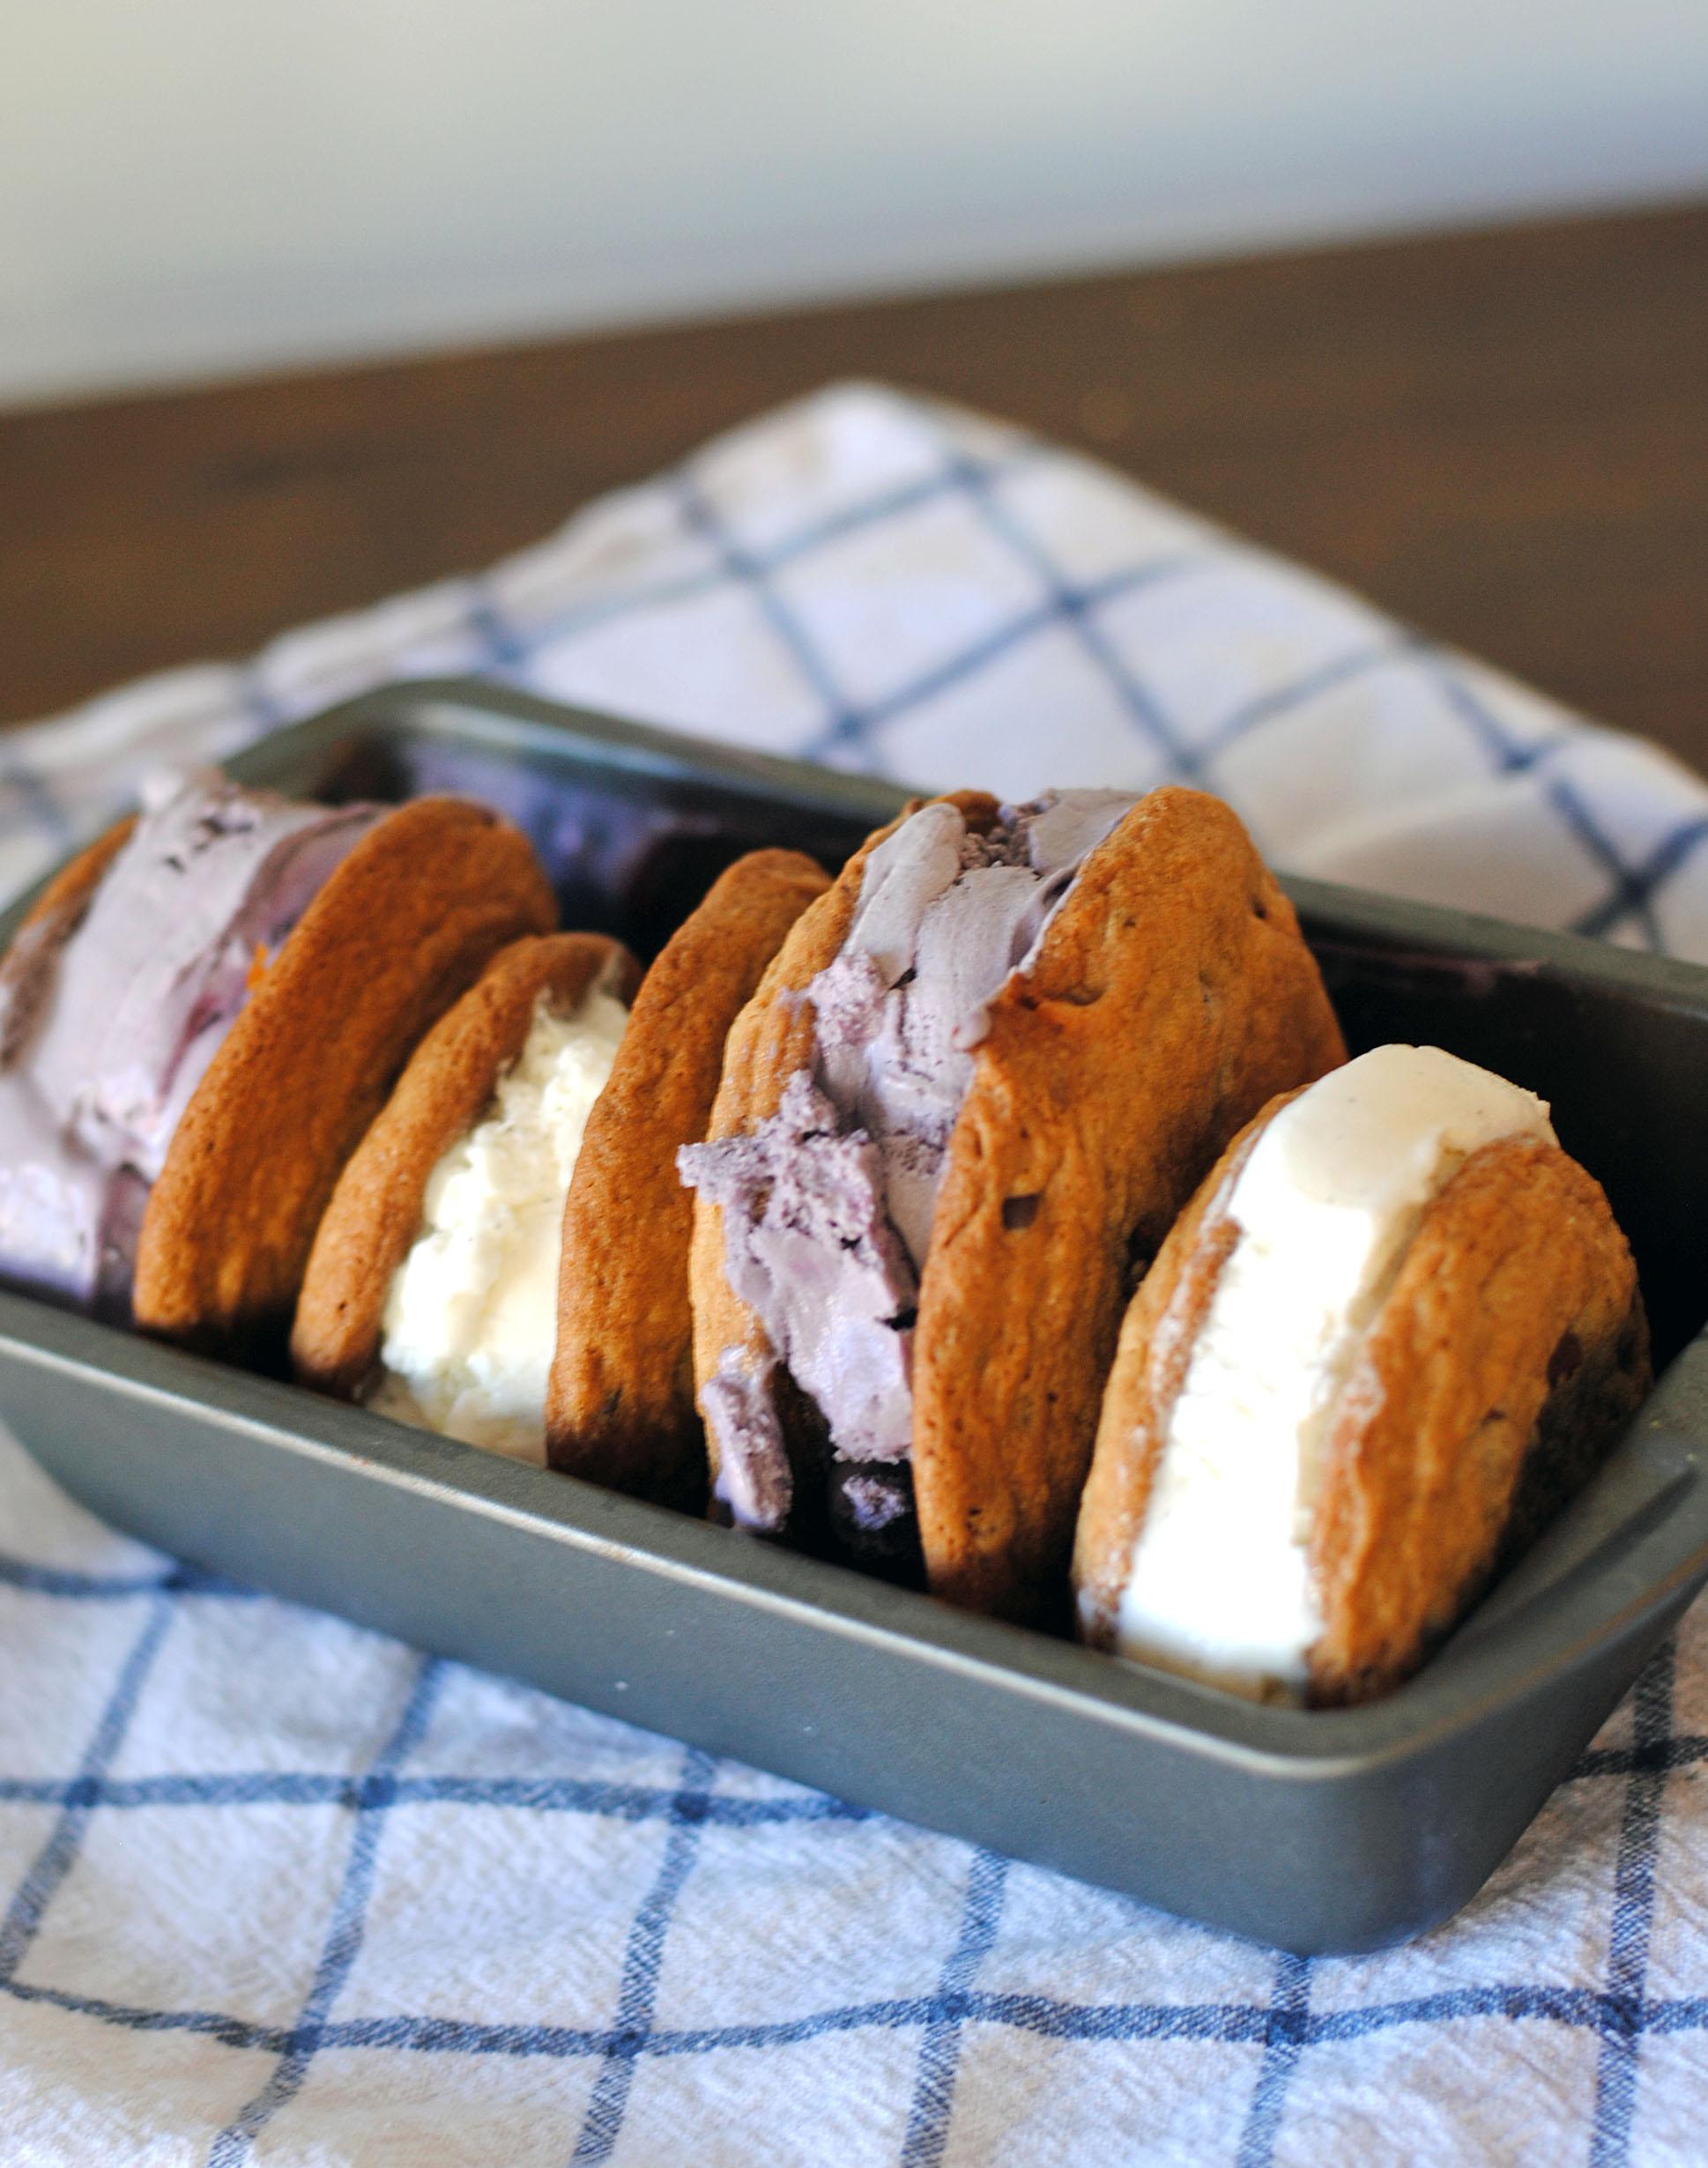 salted caramel ice cream sandwich 1